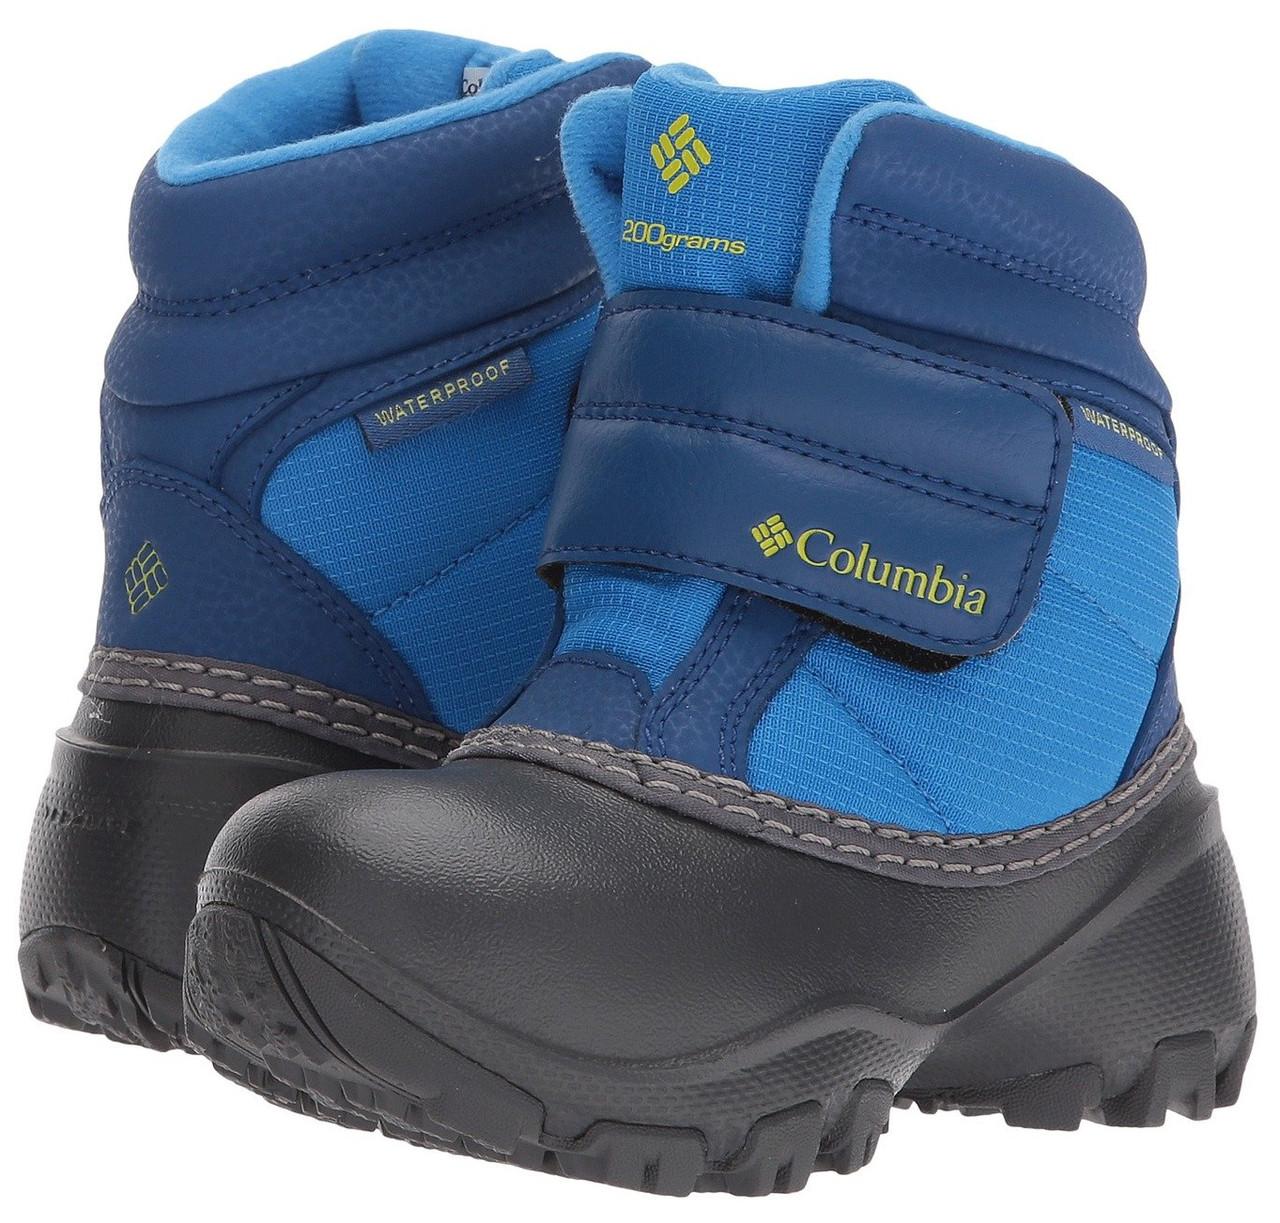 57be7ff6d ... Ботинки зимние детские Columbia Kids Rope Tow Kruser сапоги  непромокаемые, фото 3